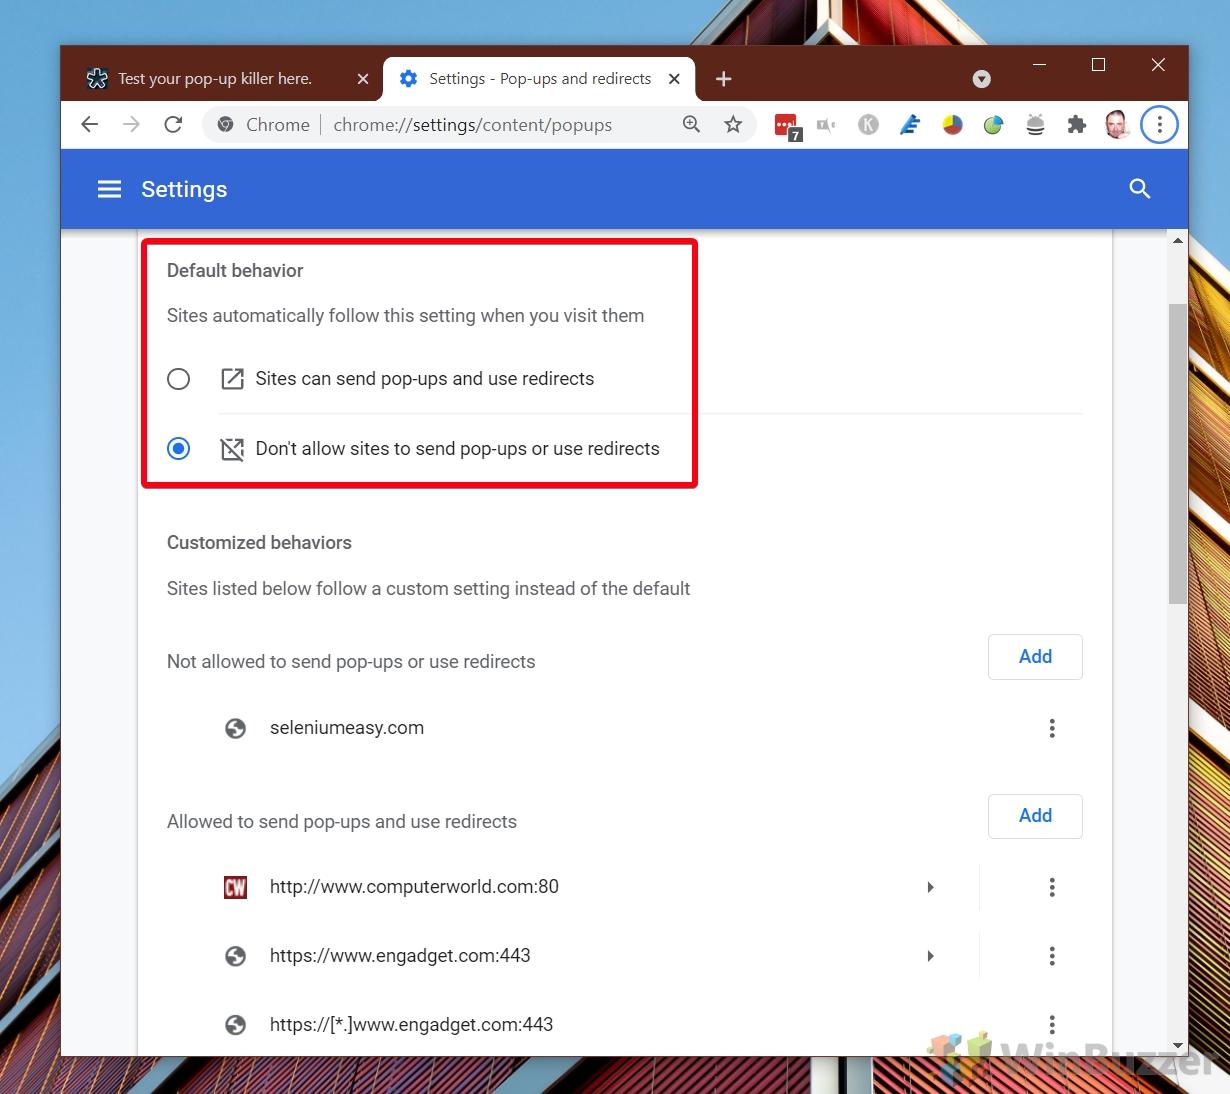 Chrome - Settings - Pop-ups and redirects - Default behavior